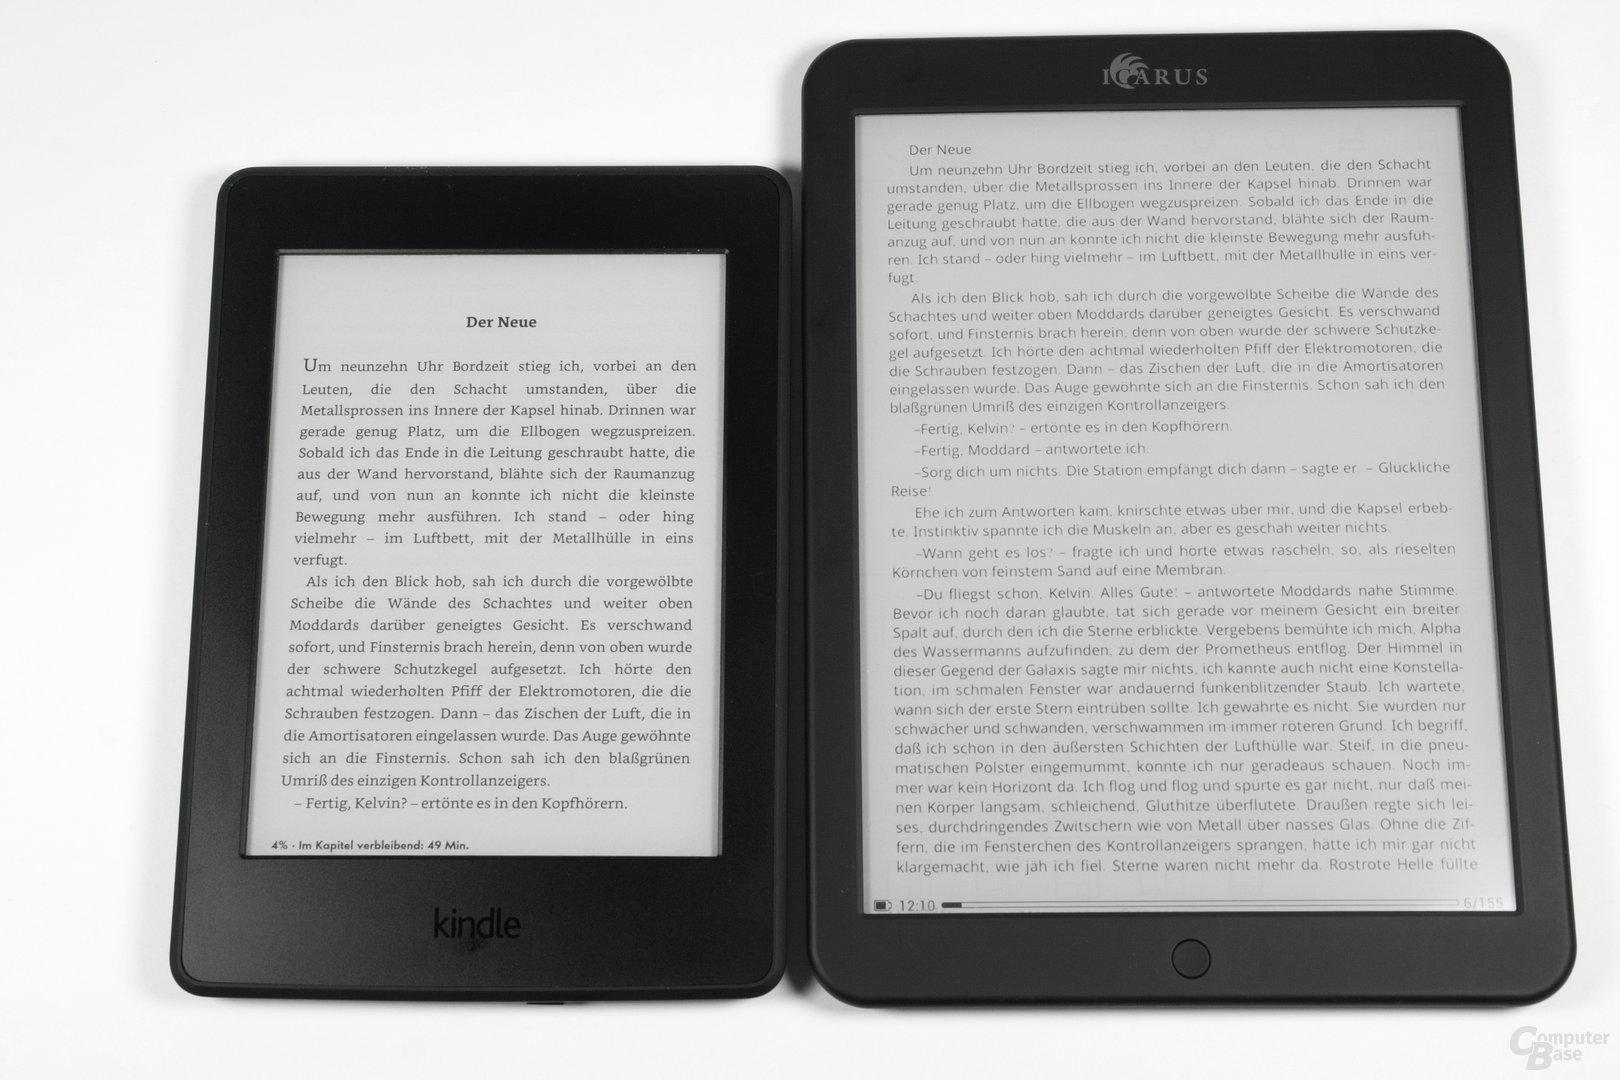 Schriftbildvergleich Kindle Paperwhite 2014 vs. Icarus Illumina XL  (FB2 Reader)